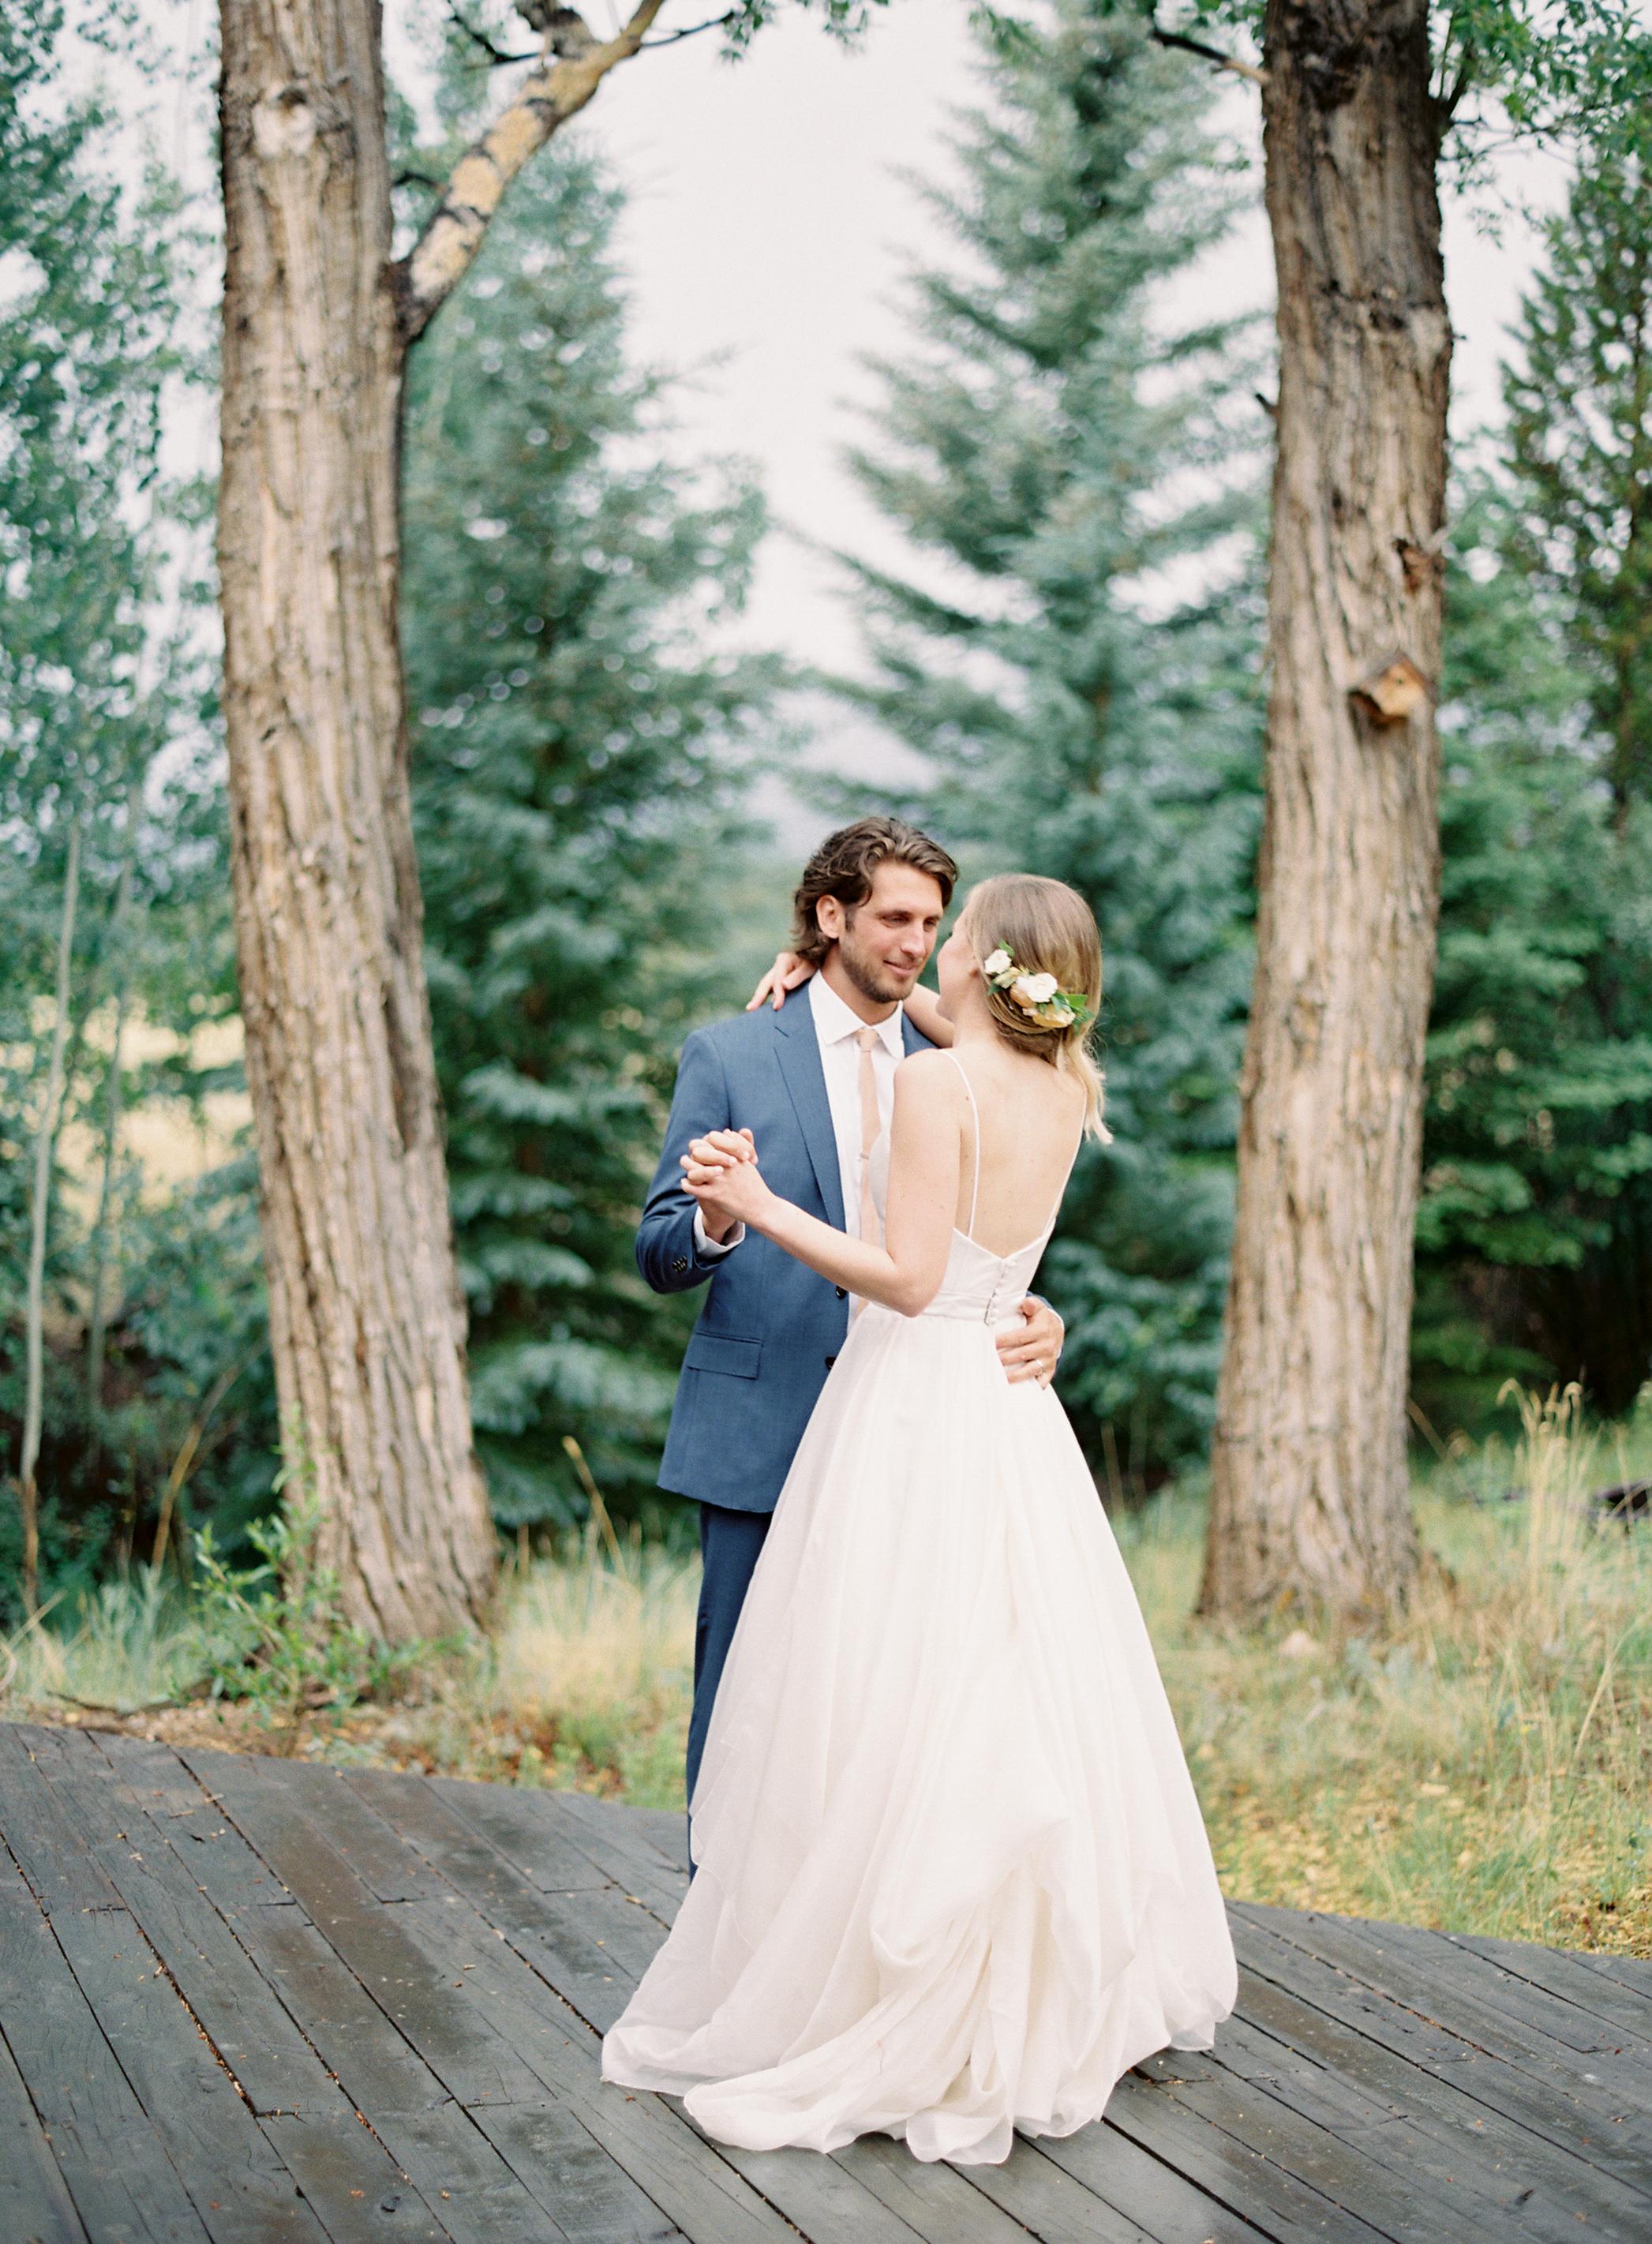 Jessica and Thomas-Wedding-Carrie King Photographer-21.jpg